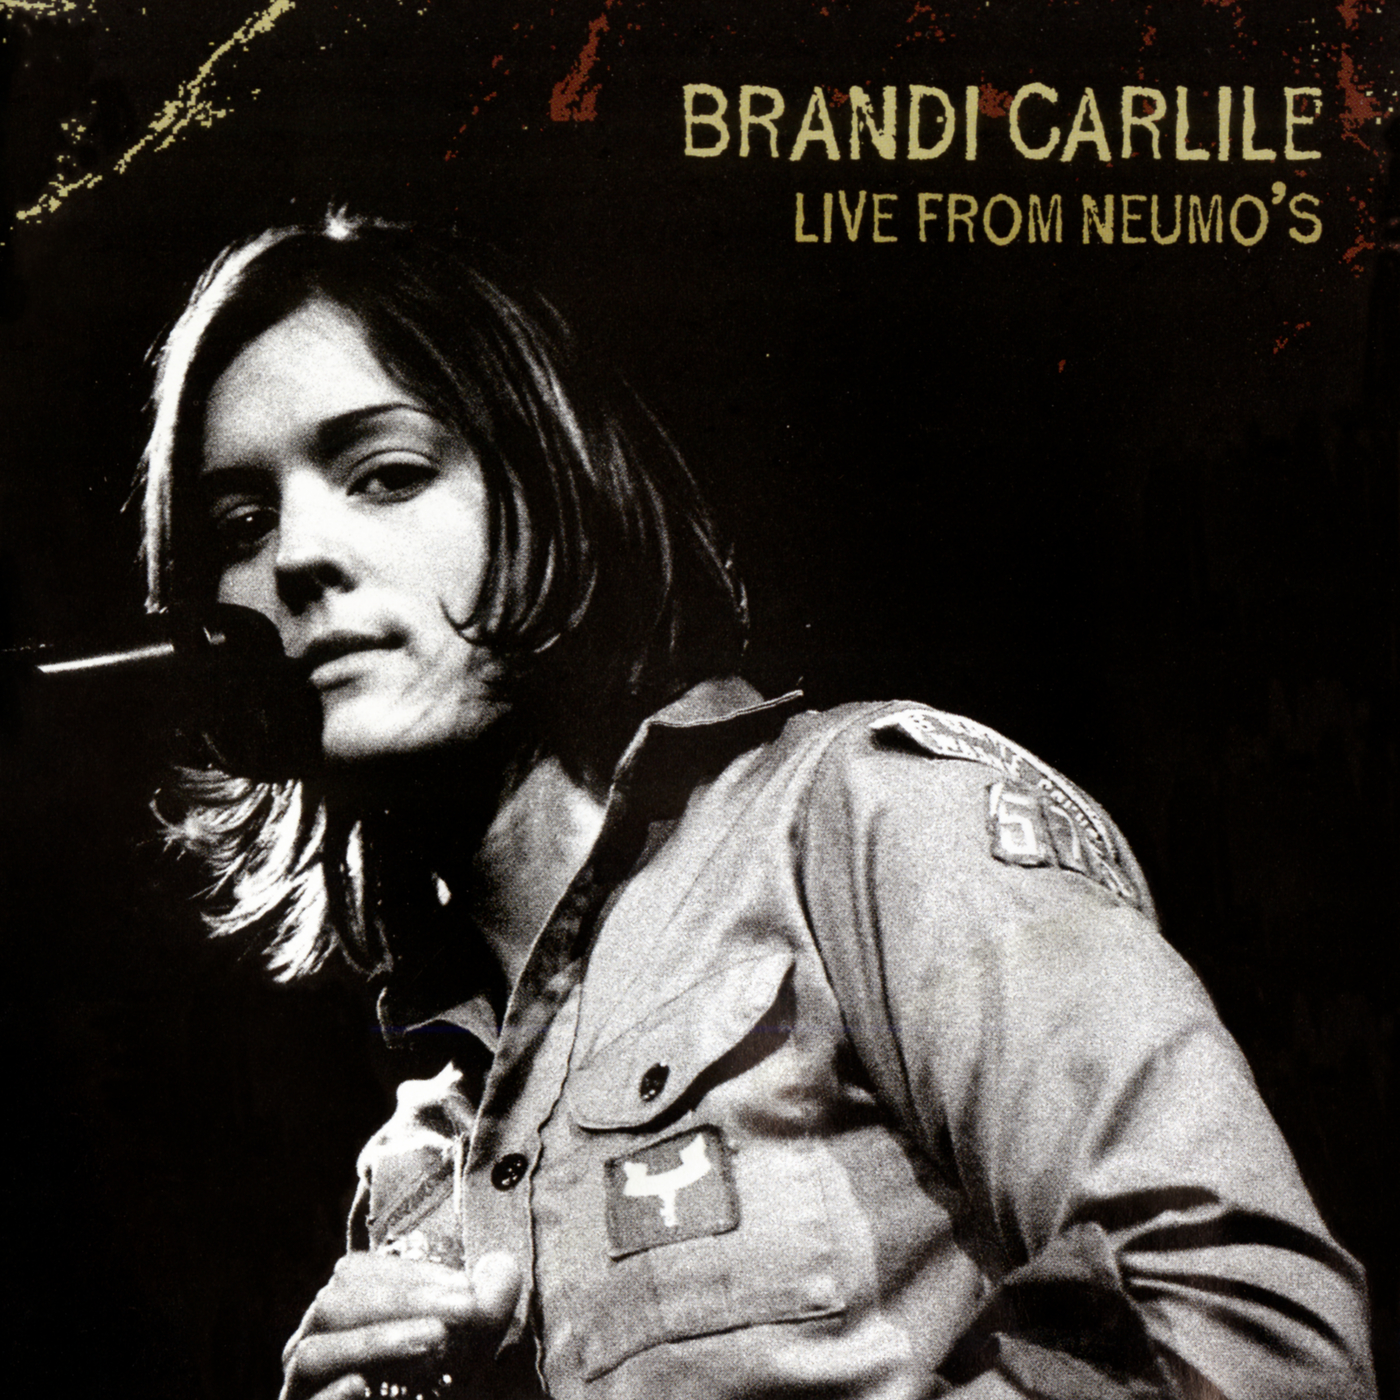 Live from Neumo's - Brandi Carlile